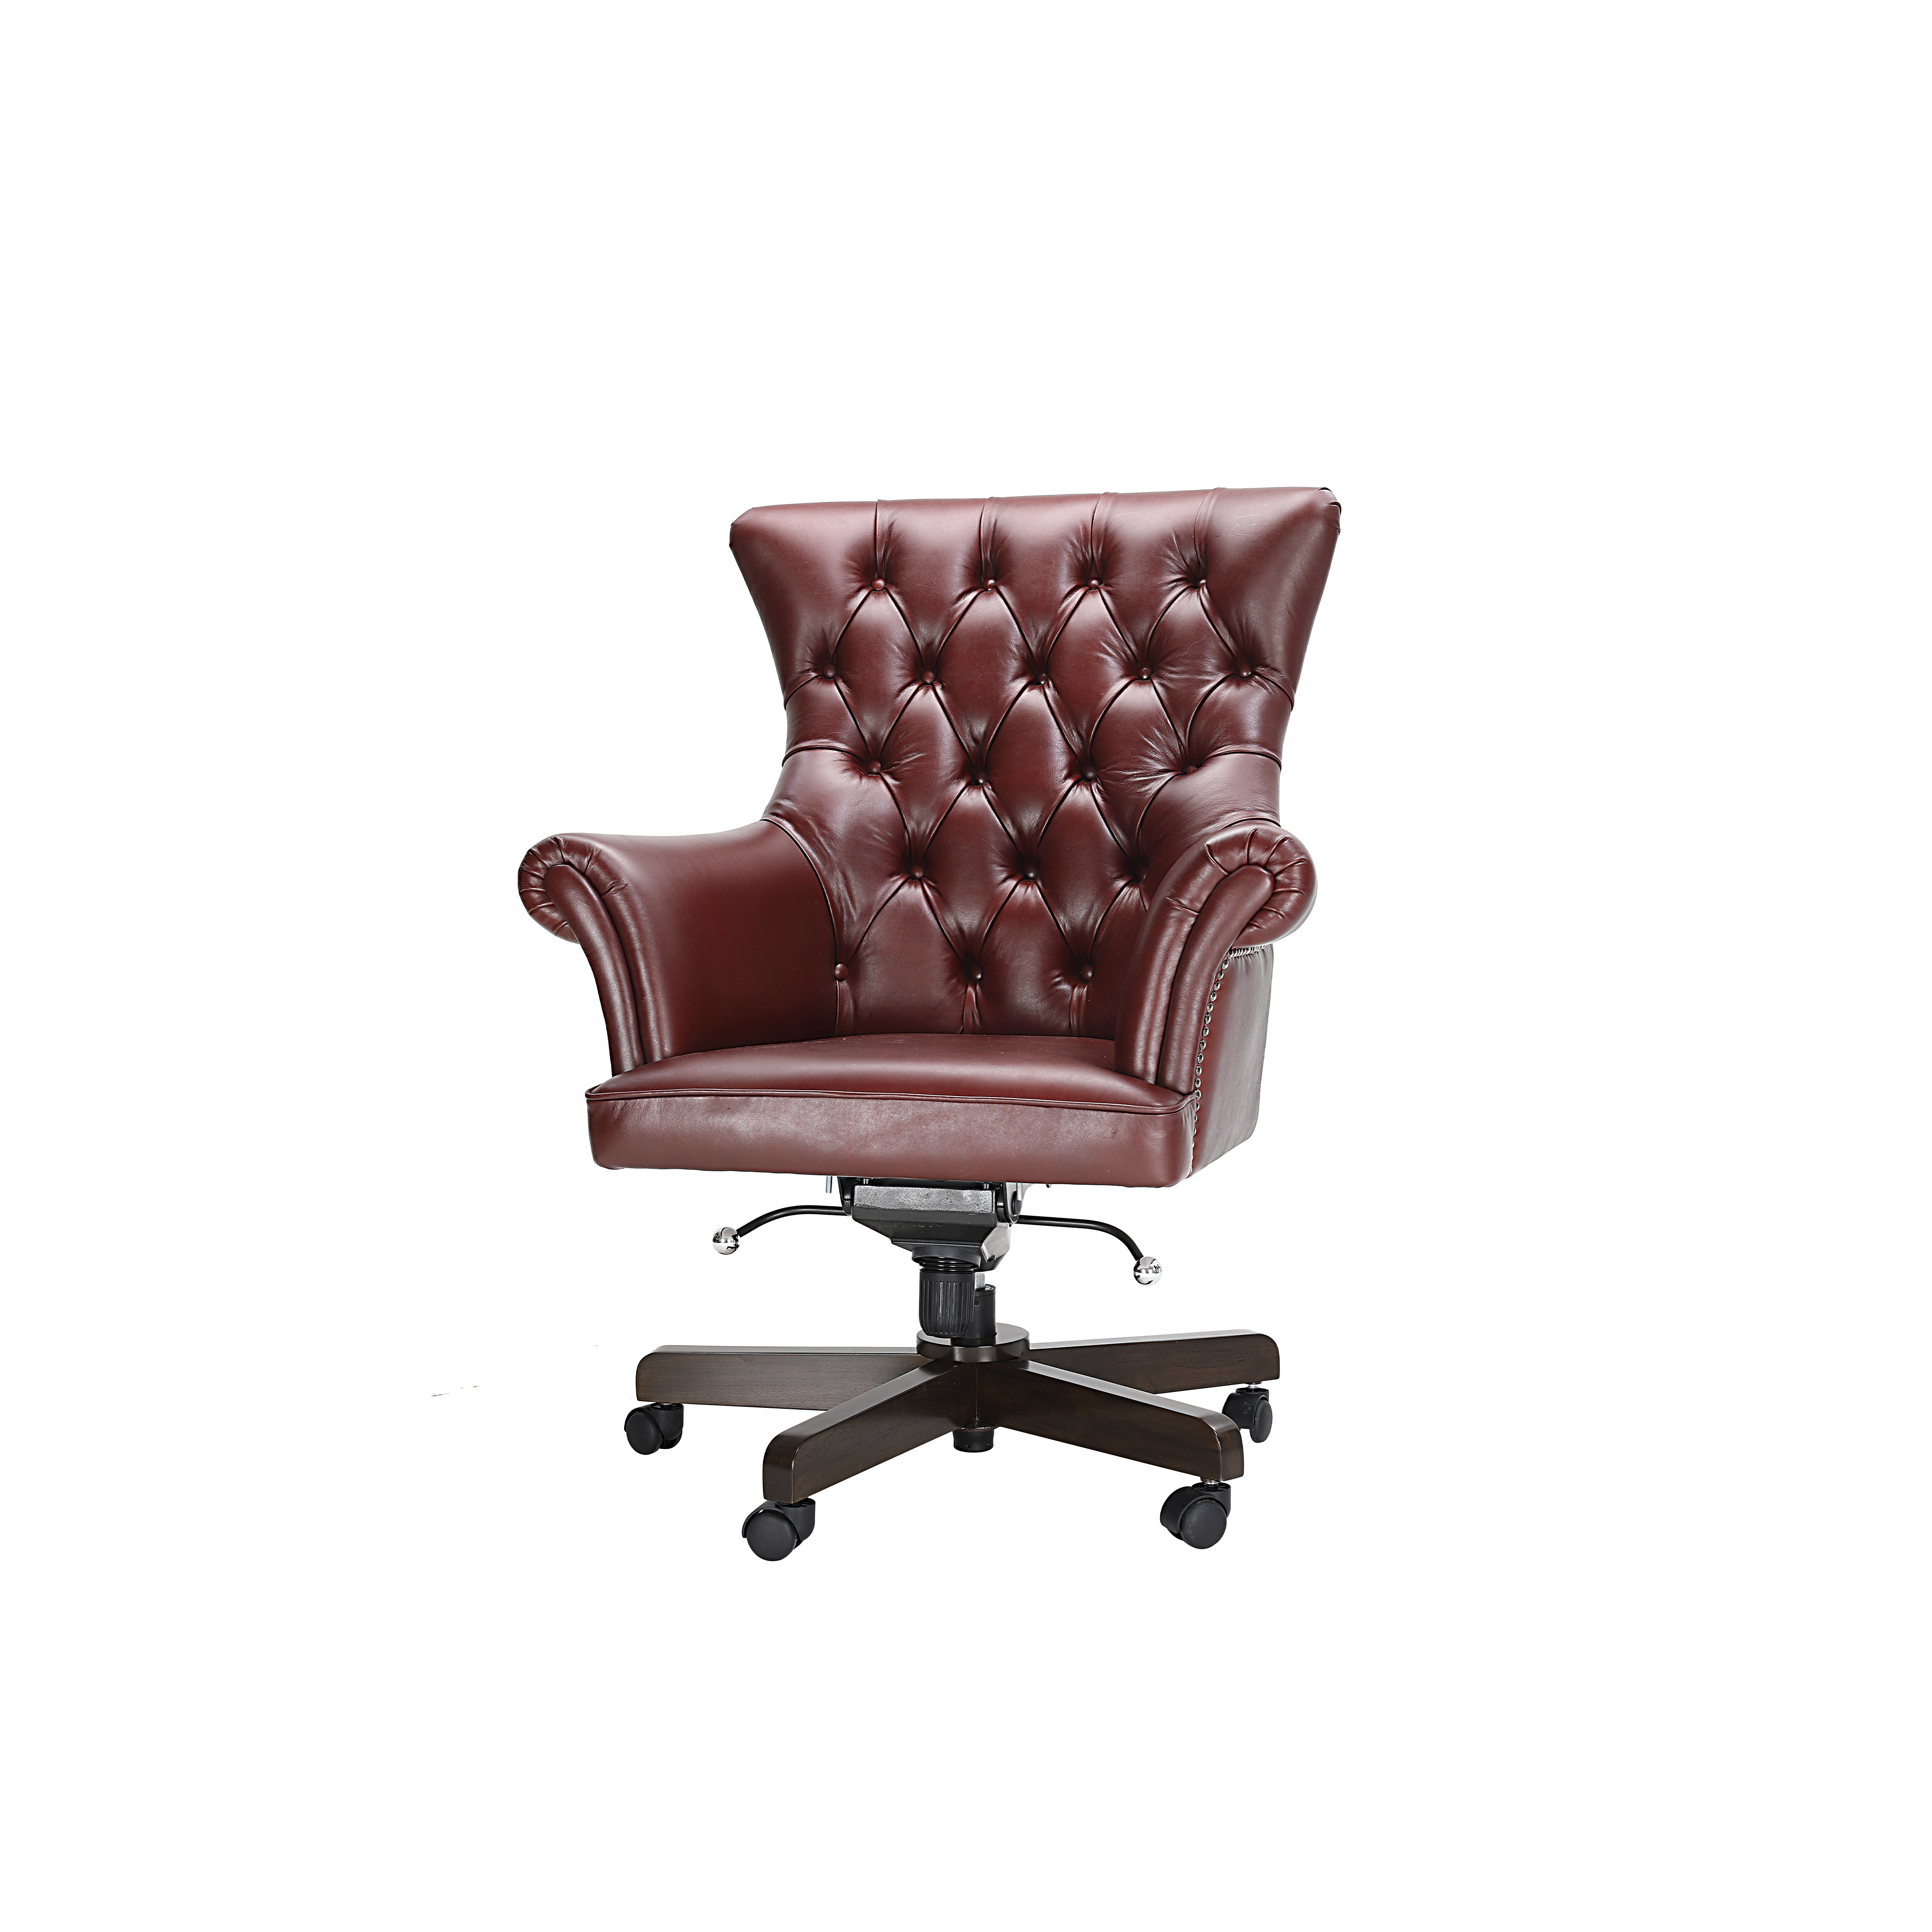 Hybrid swivel chair